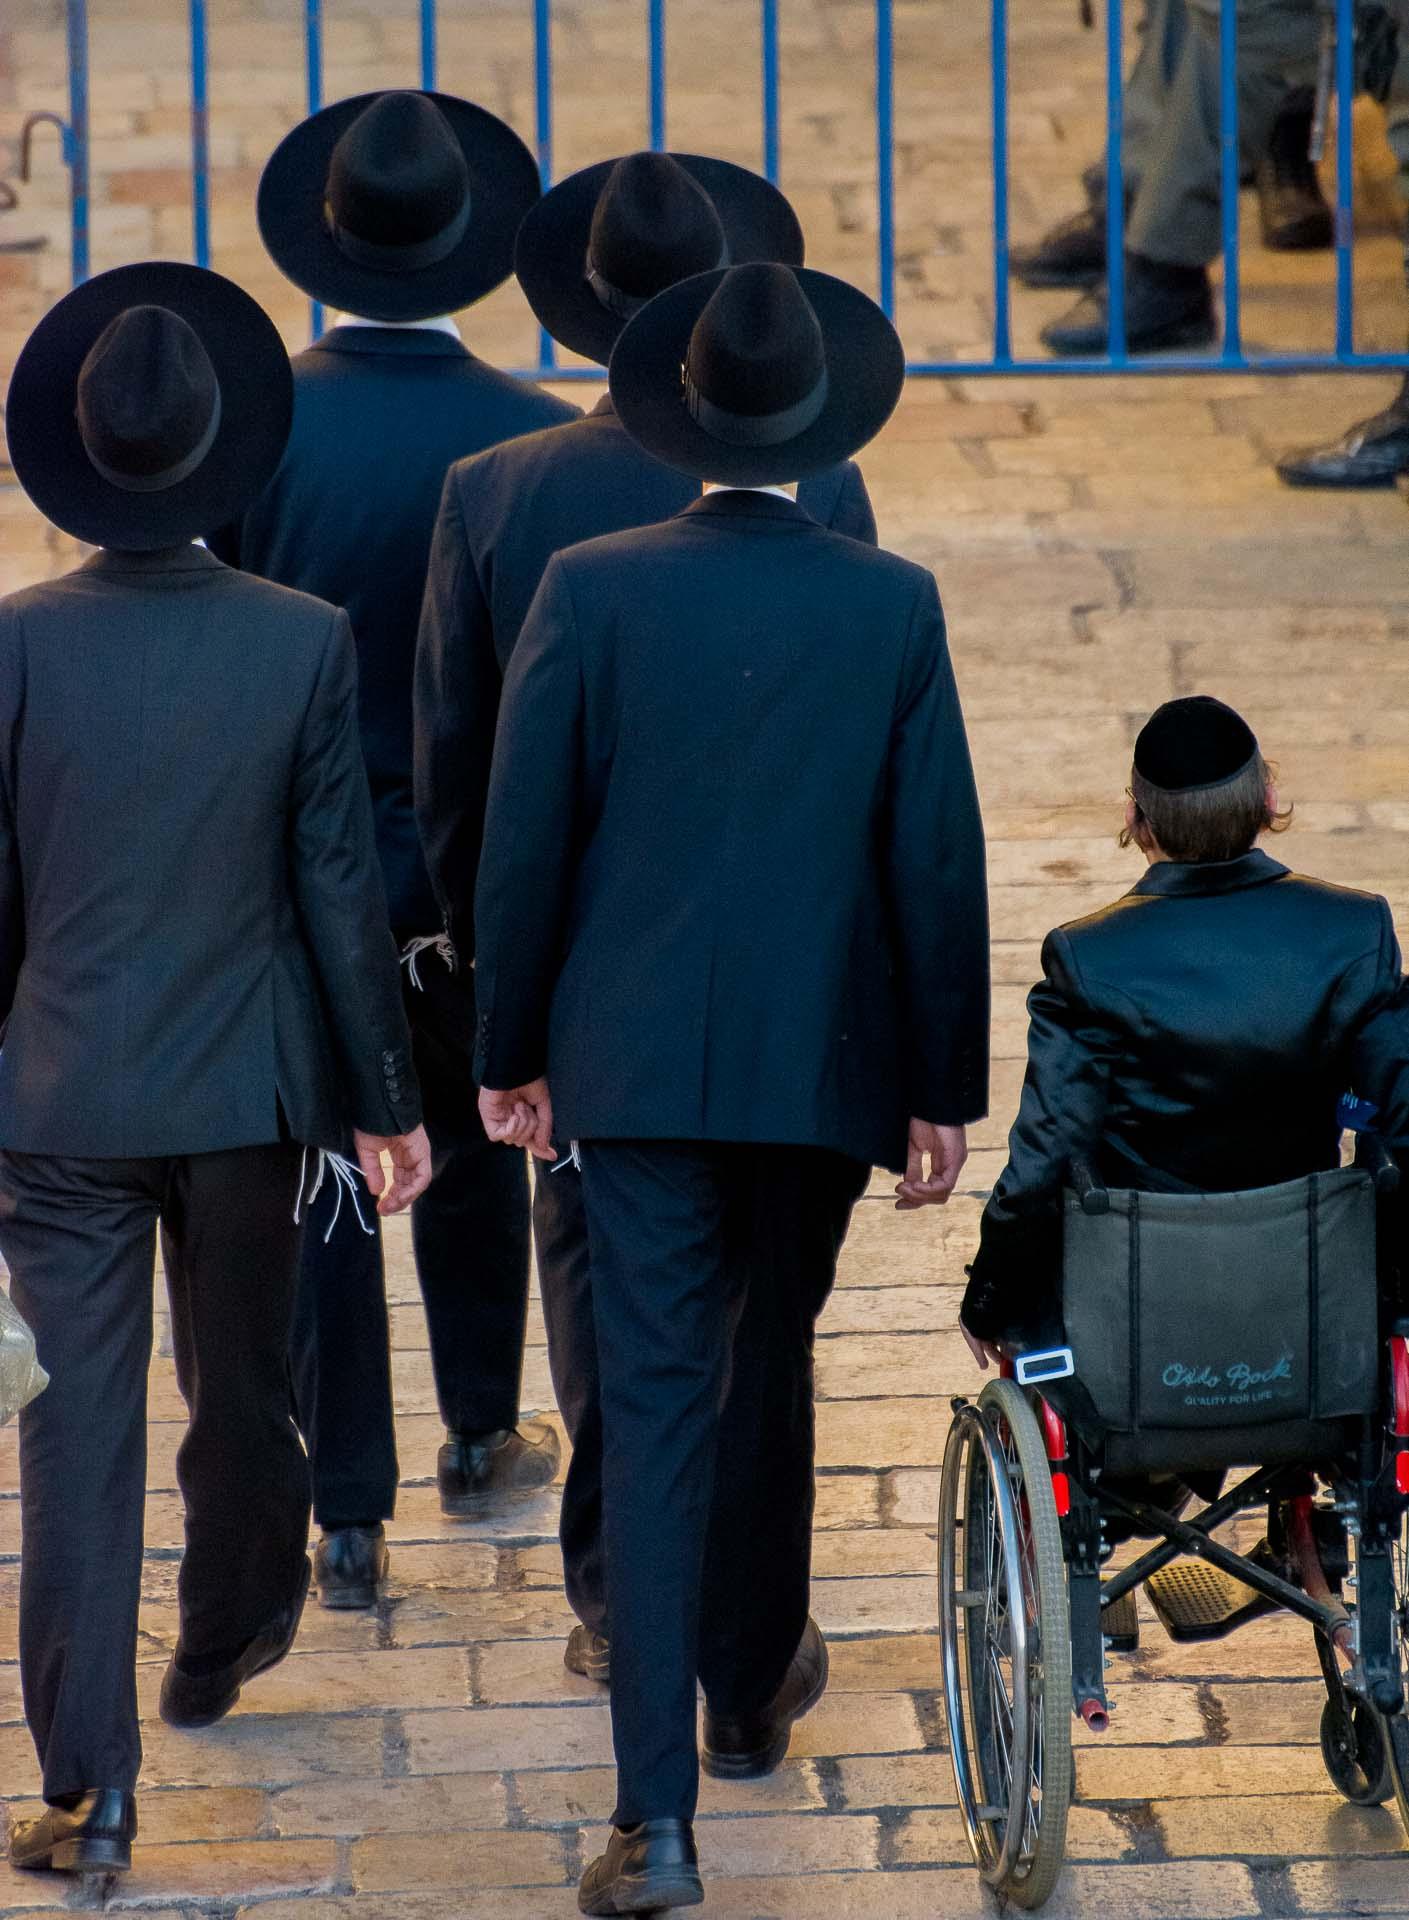 Bob Demyan Photography - Israel